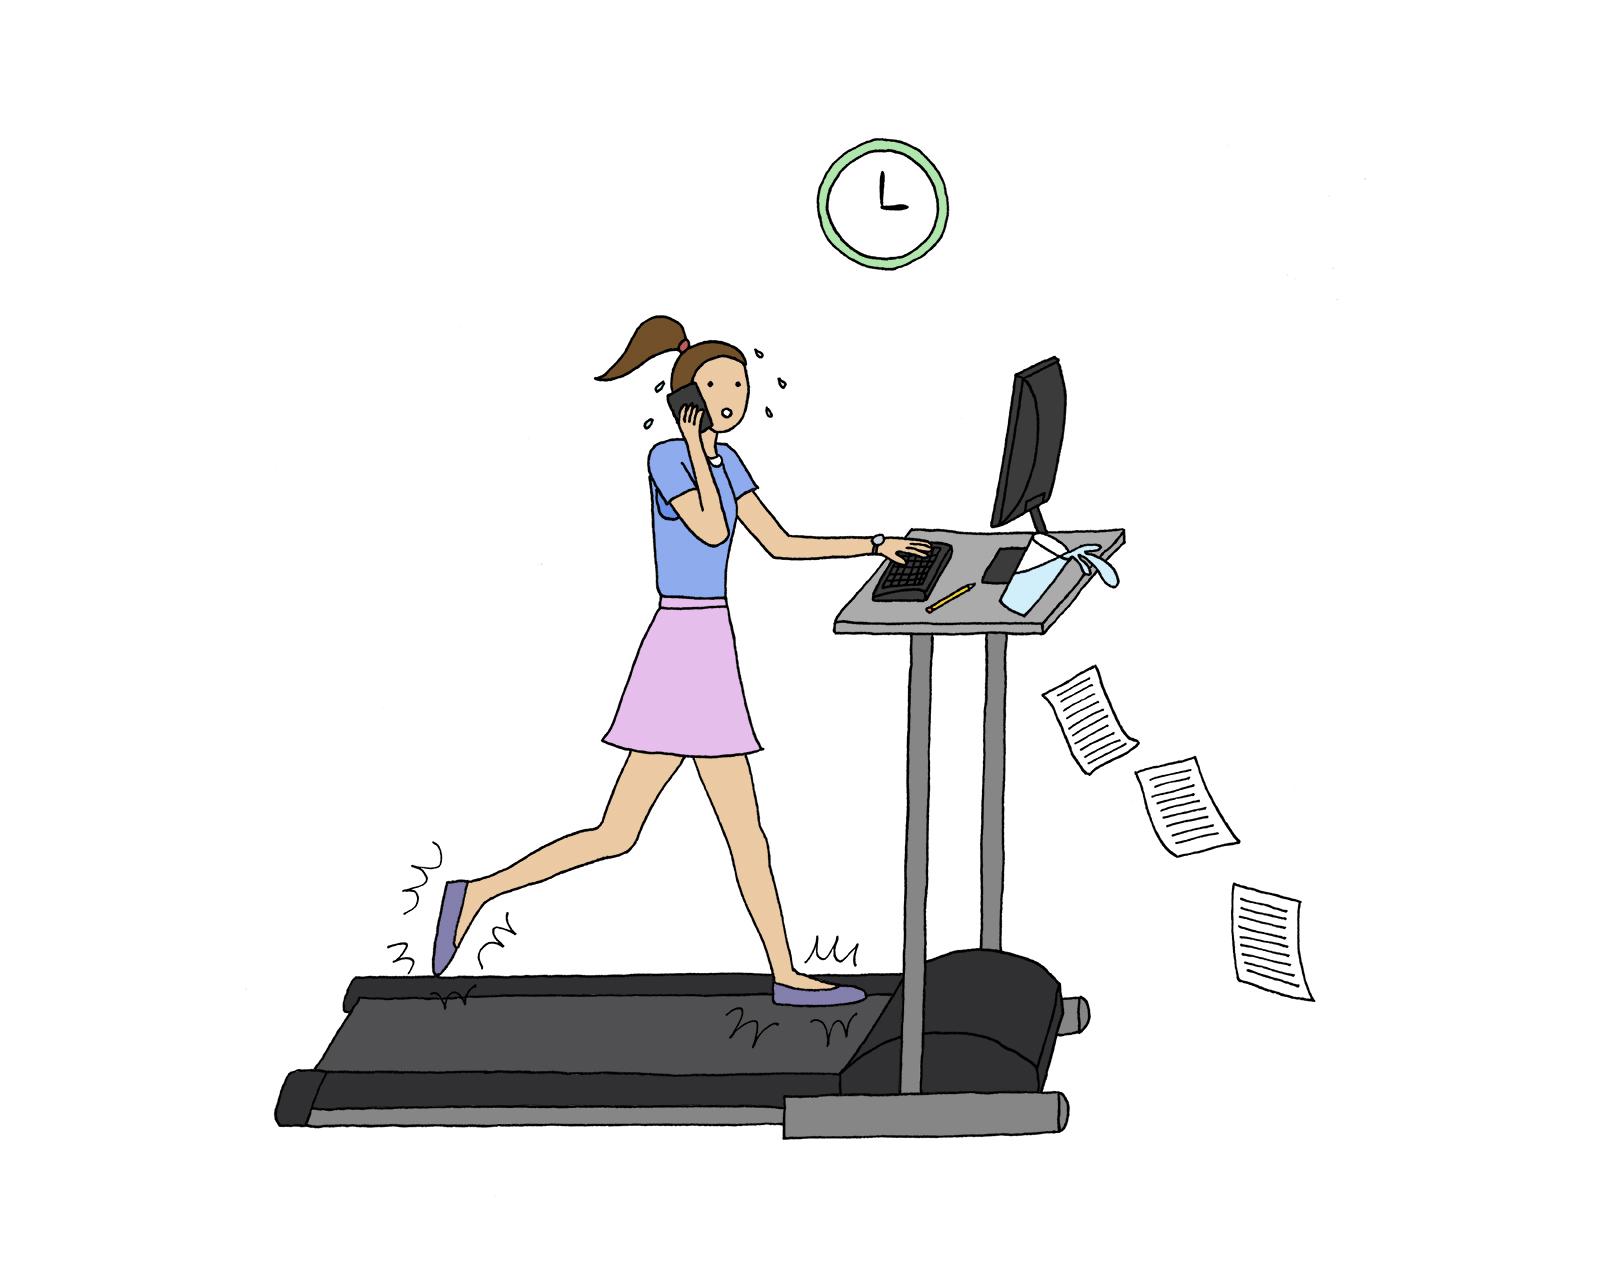 Treadmill Desk - emi ito illustration